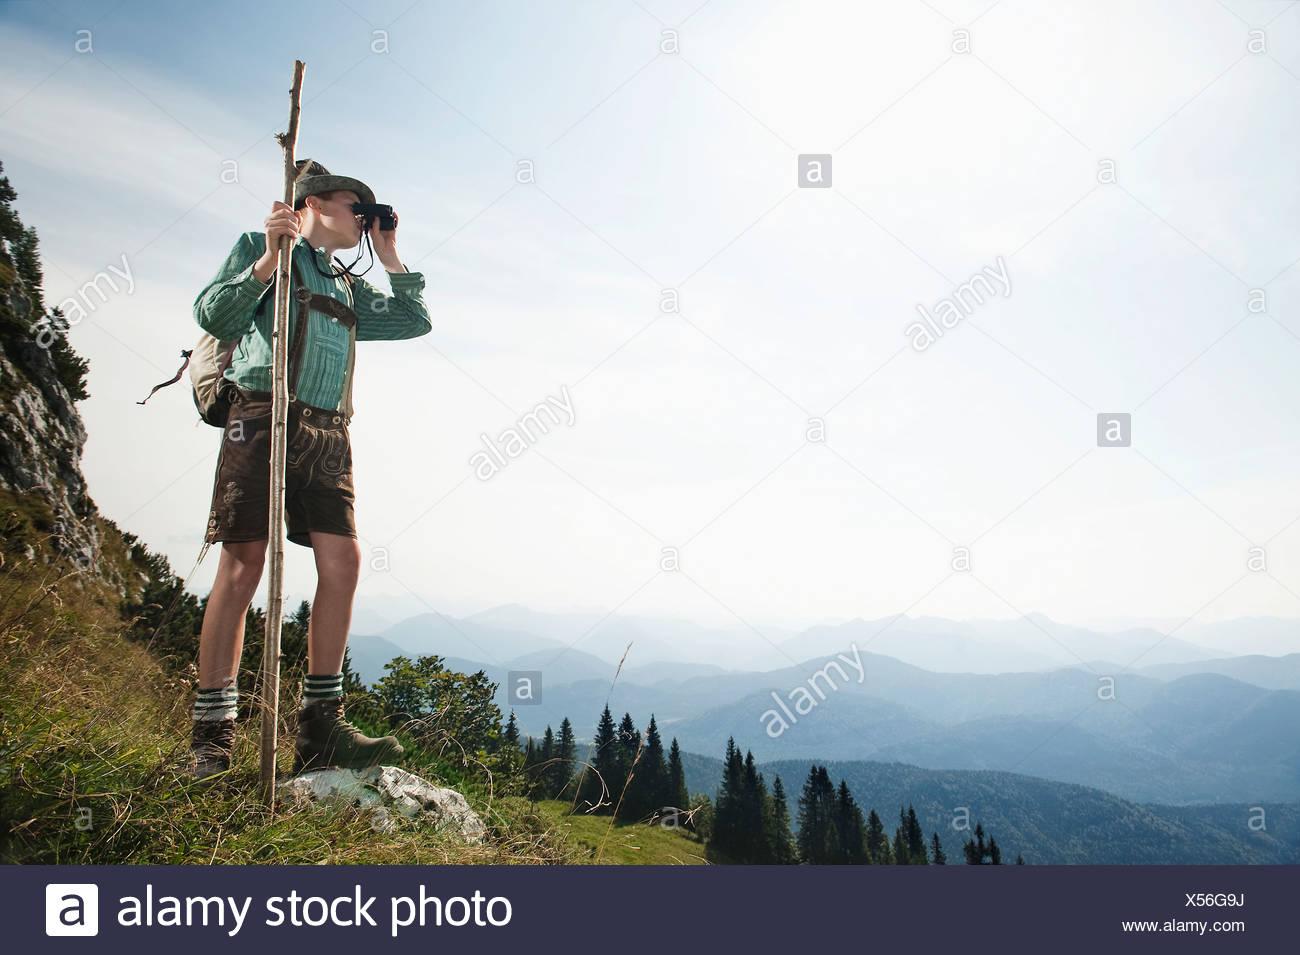 Germany, Bavaria, Boy looking through binoculars in the mountains - Stock Image